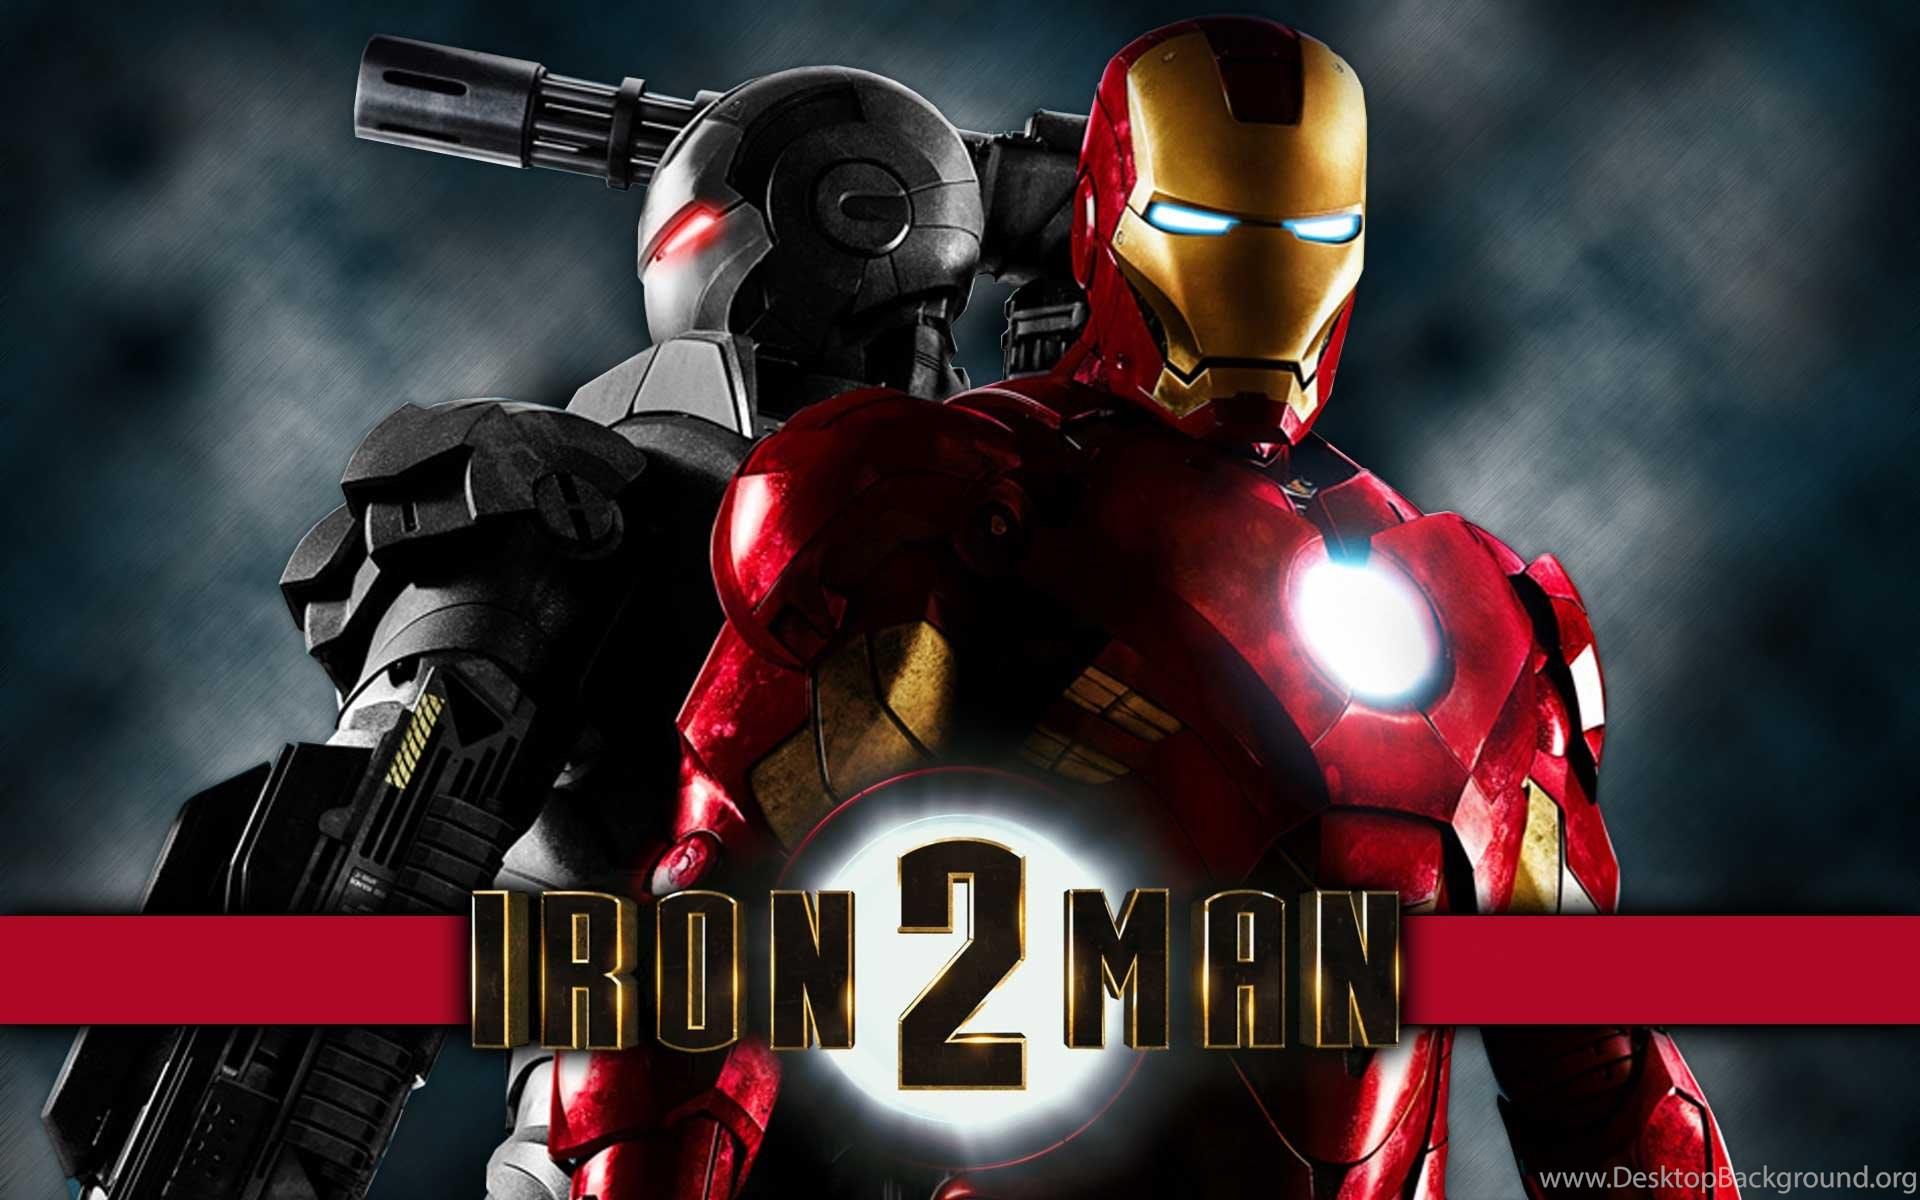 iron man 3 hd movie wallpapers desktop background